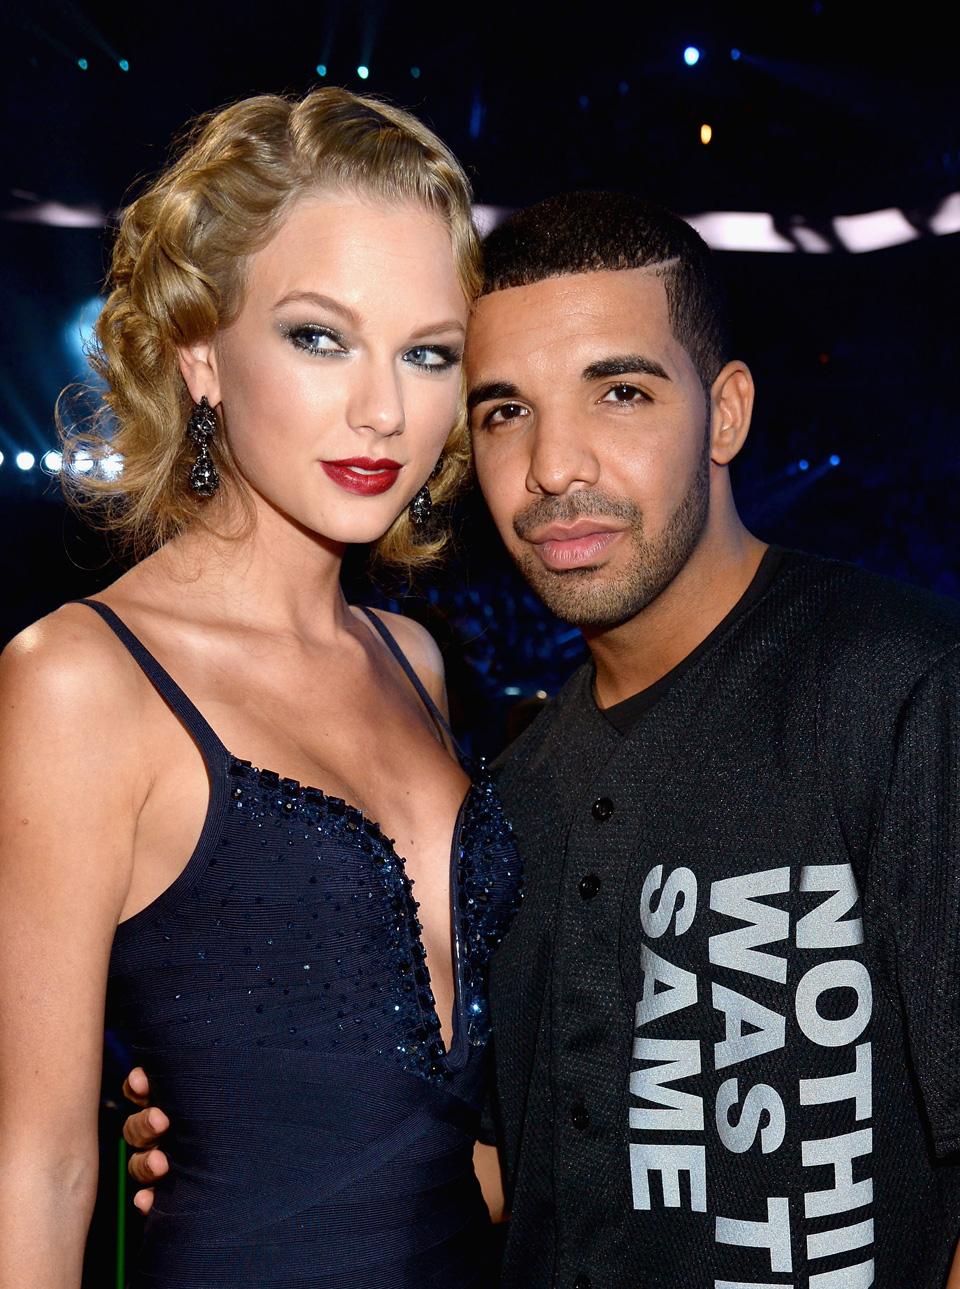 Drake and Taylor Swift